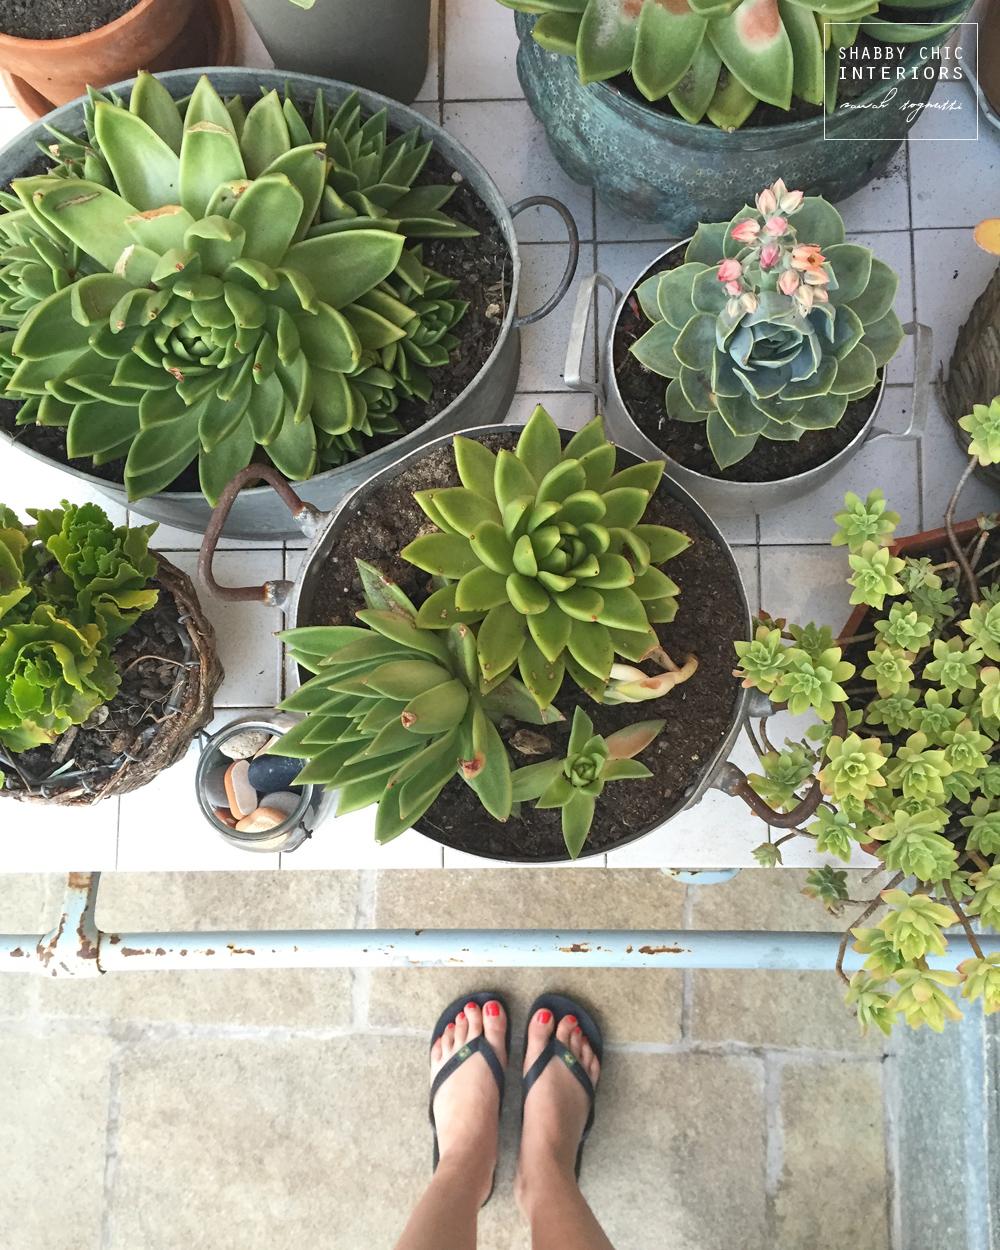 Il mio piccolo giardino shabby chic interiors - Shabby chic giardino ...